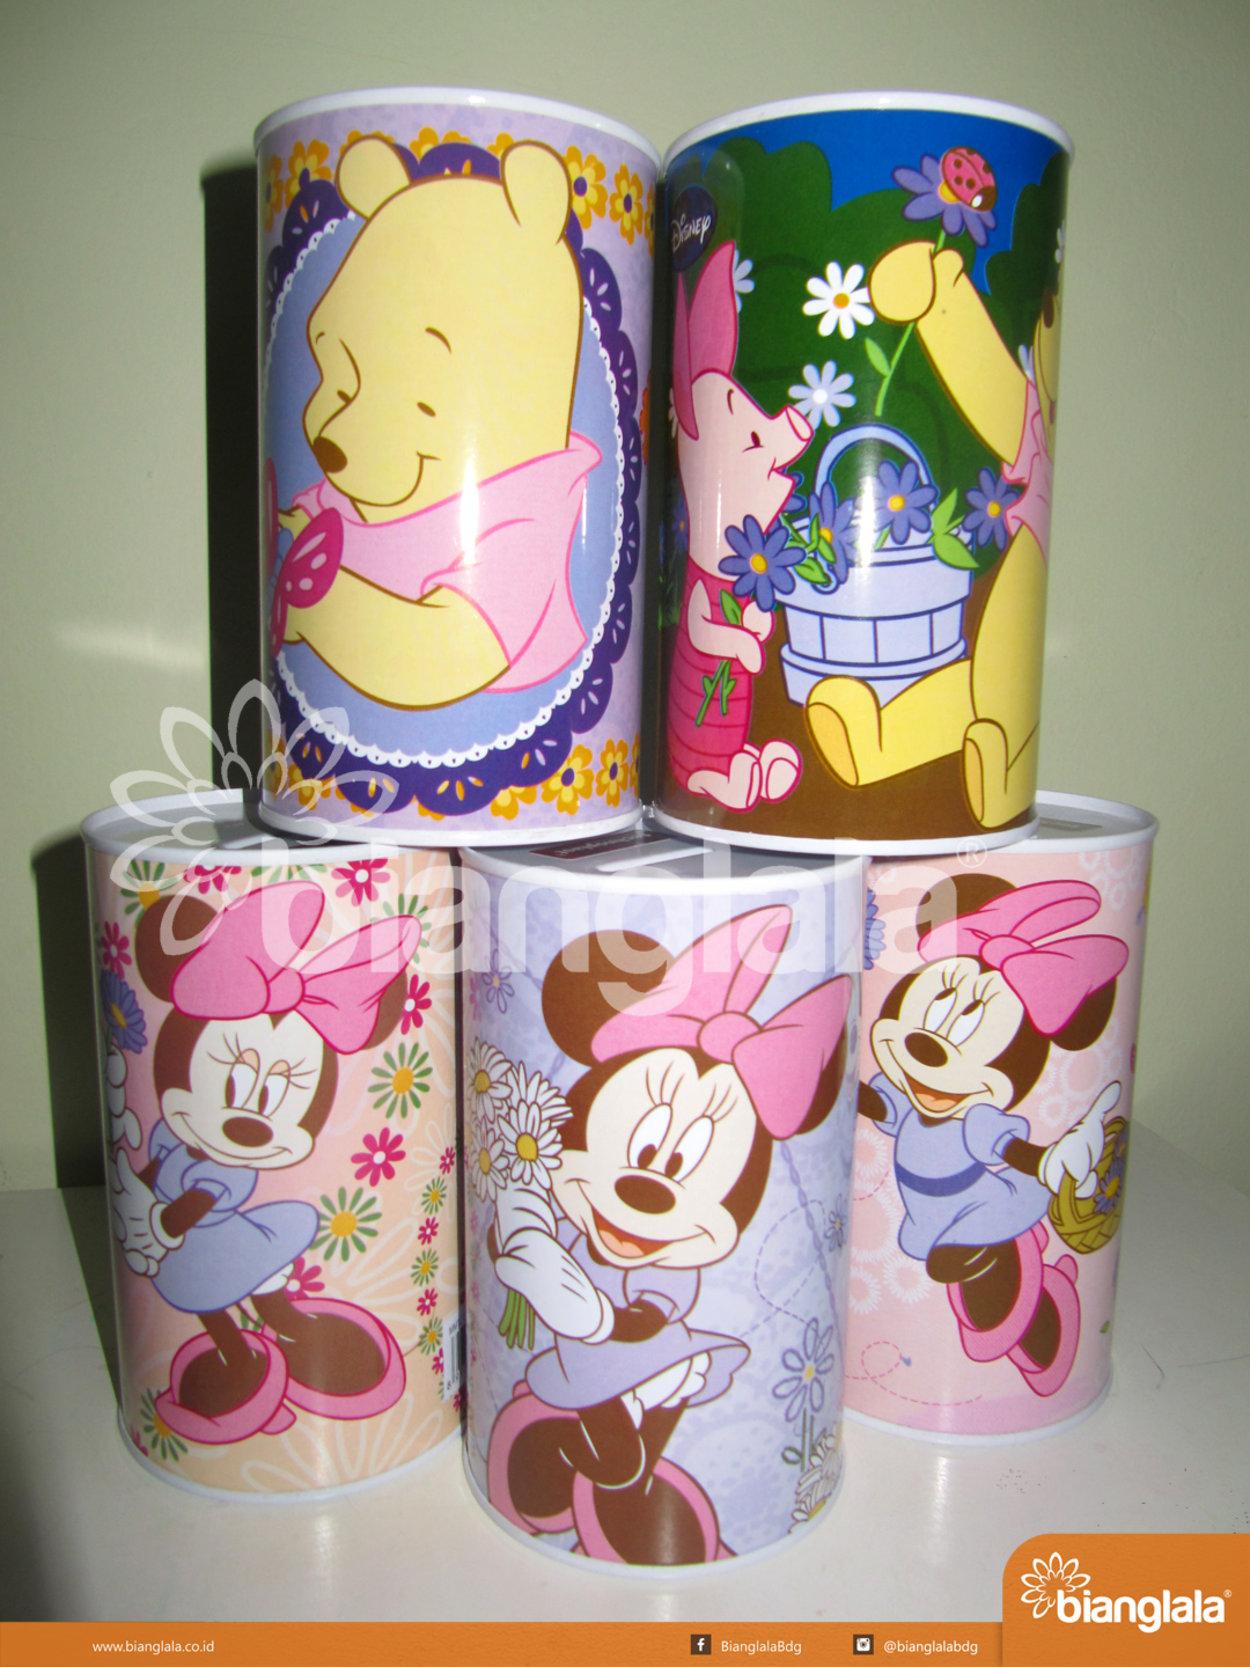 celengan minie mouse winnie d pooh1